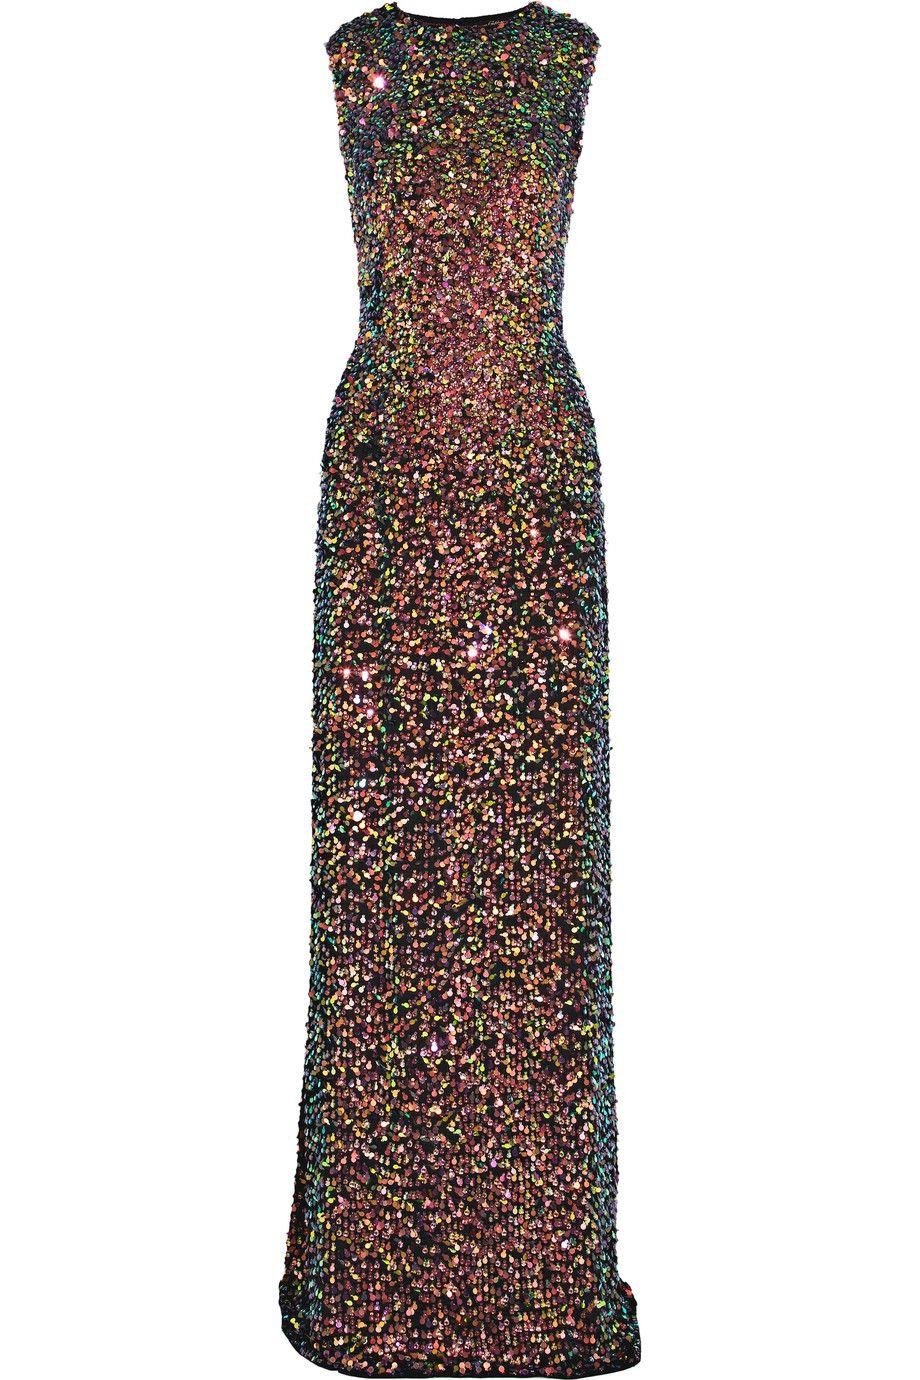 JENNY PACKHAM . #jennypackham #cloth #gown